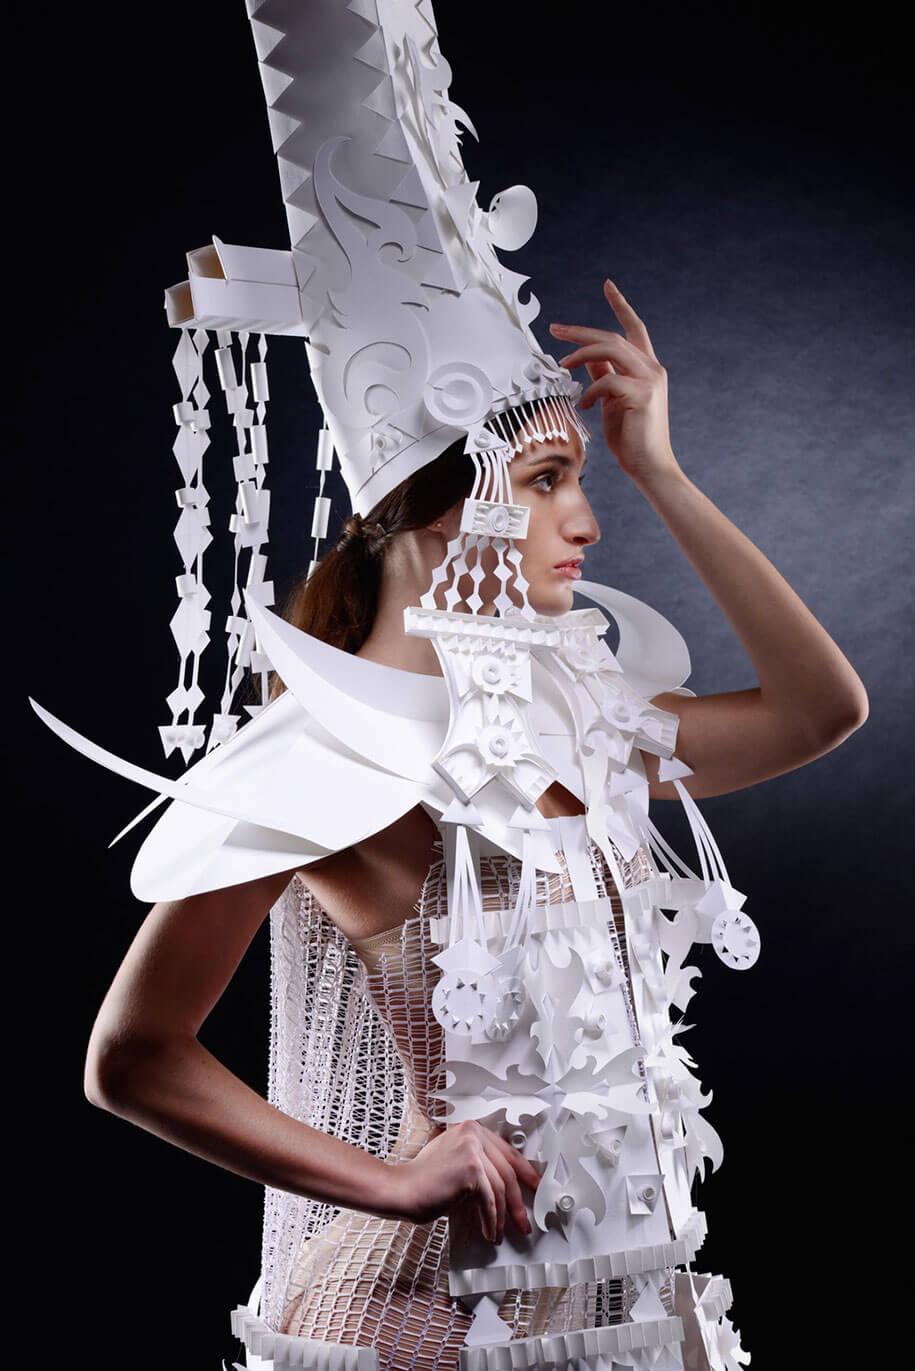 paper-wigs-azya-kozina-fy-8